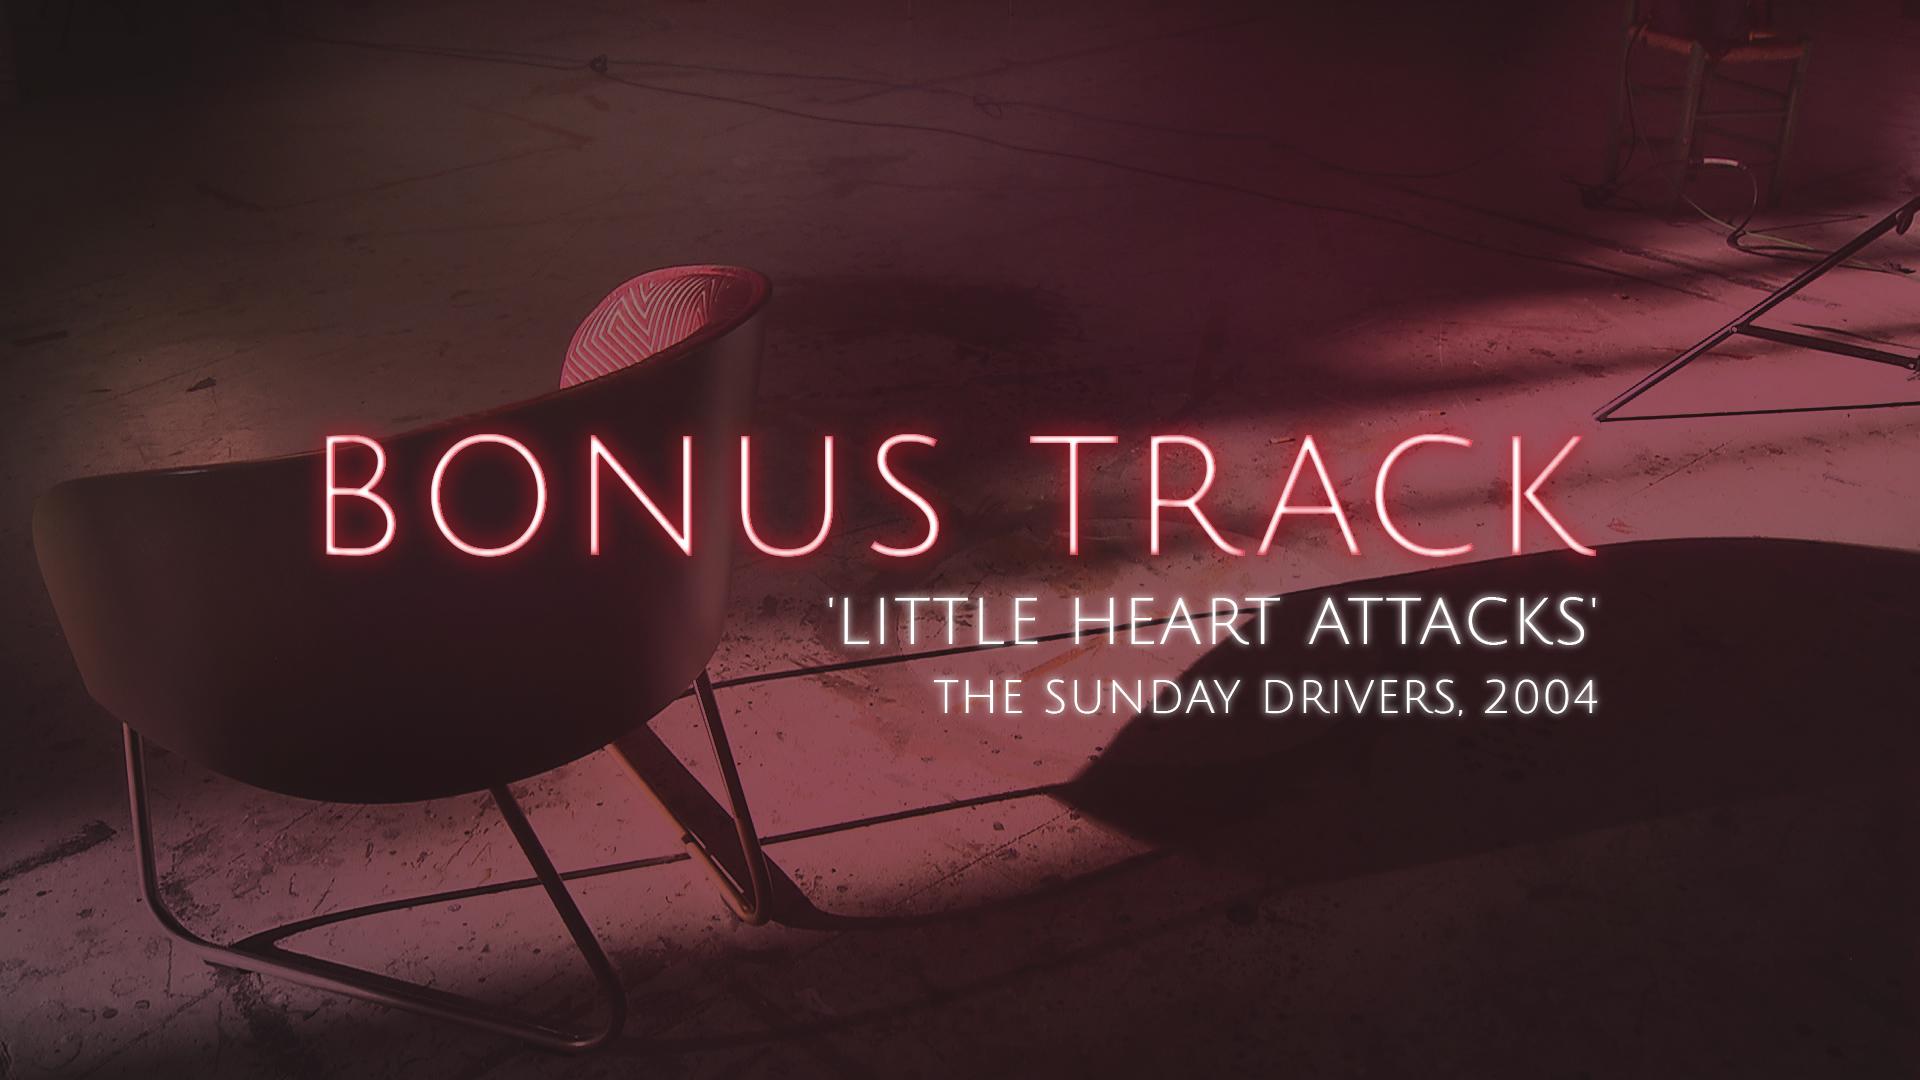 'Little Heart Attacks', The Sunday Drivers (Teaser)